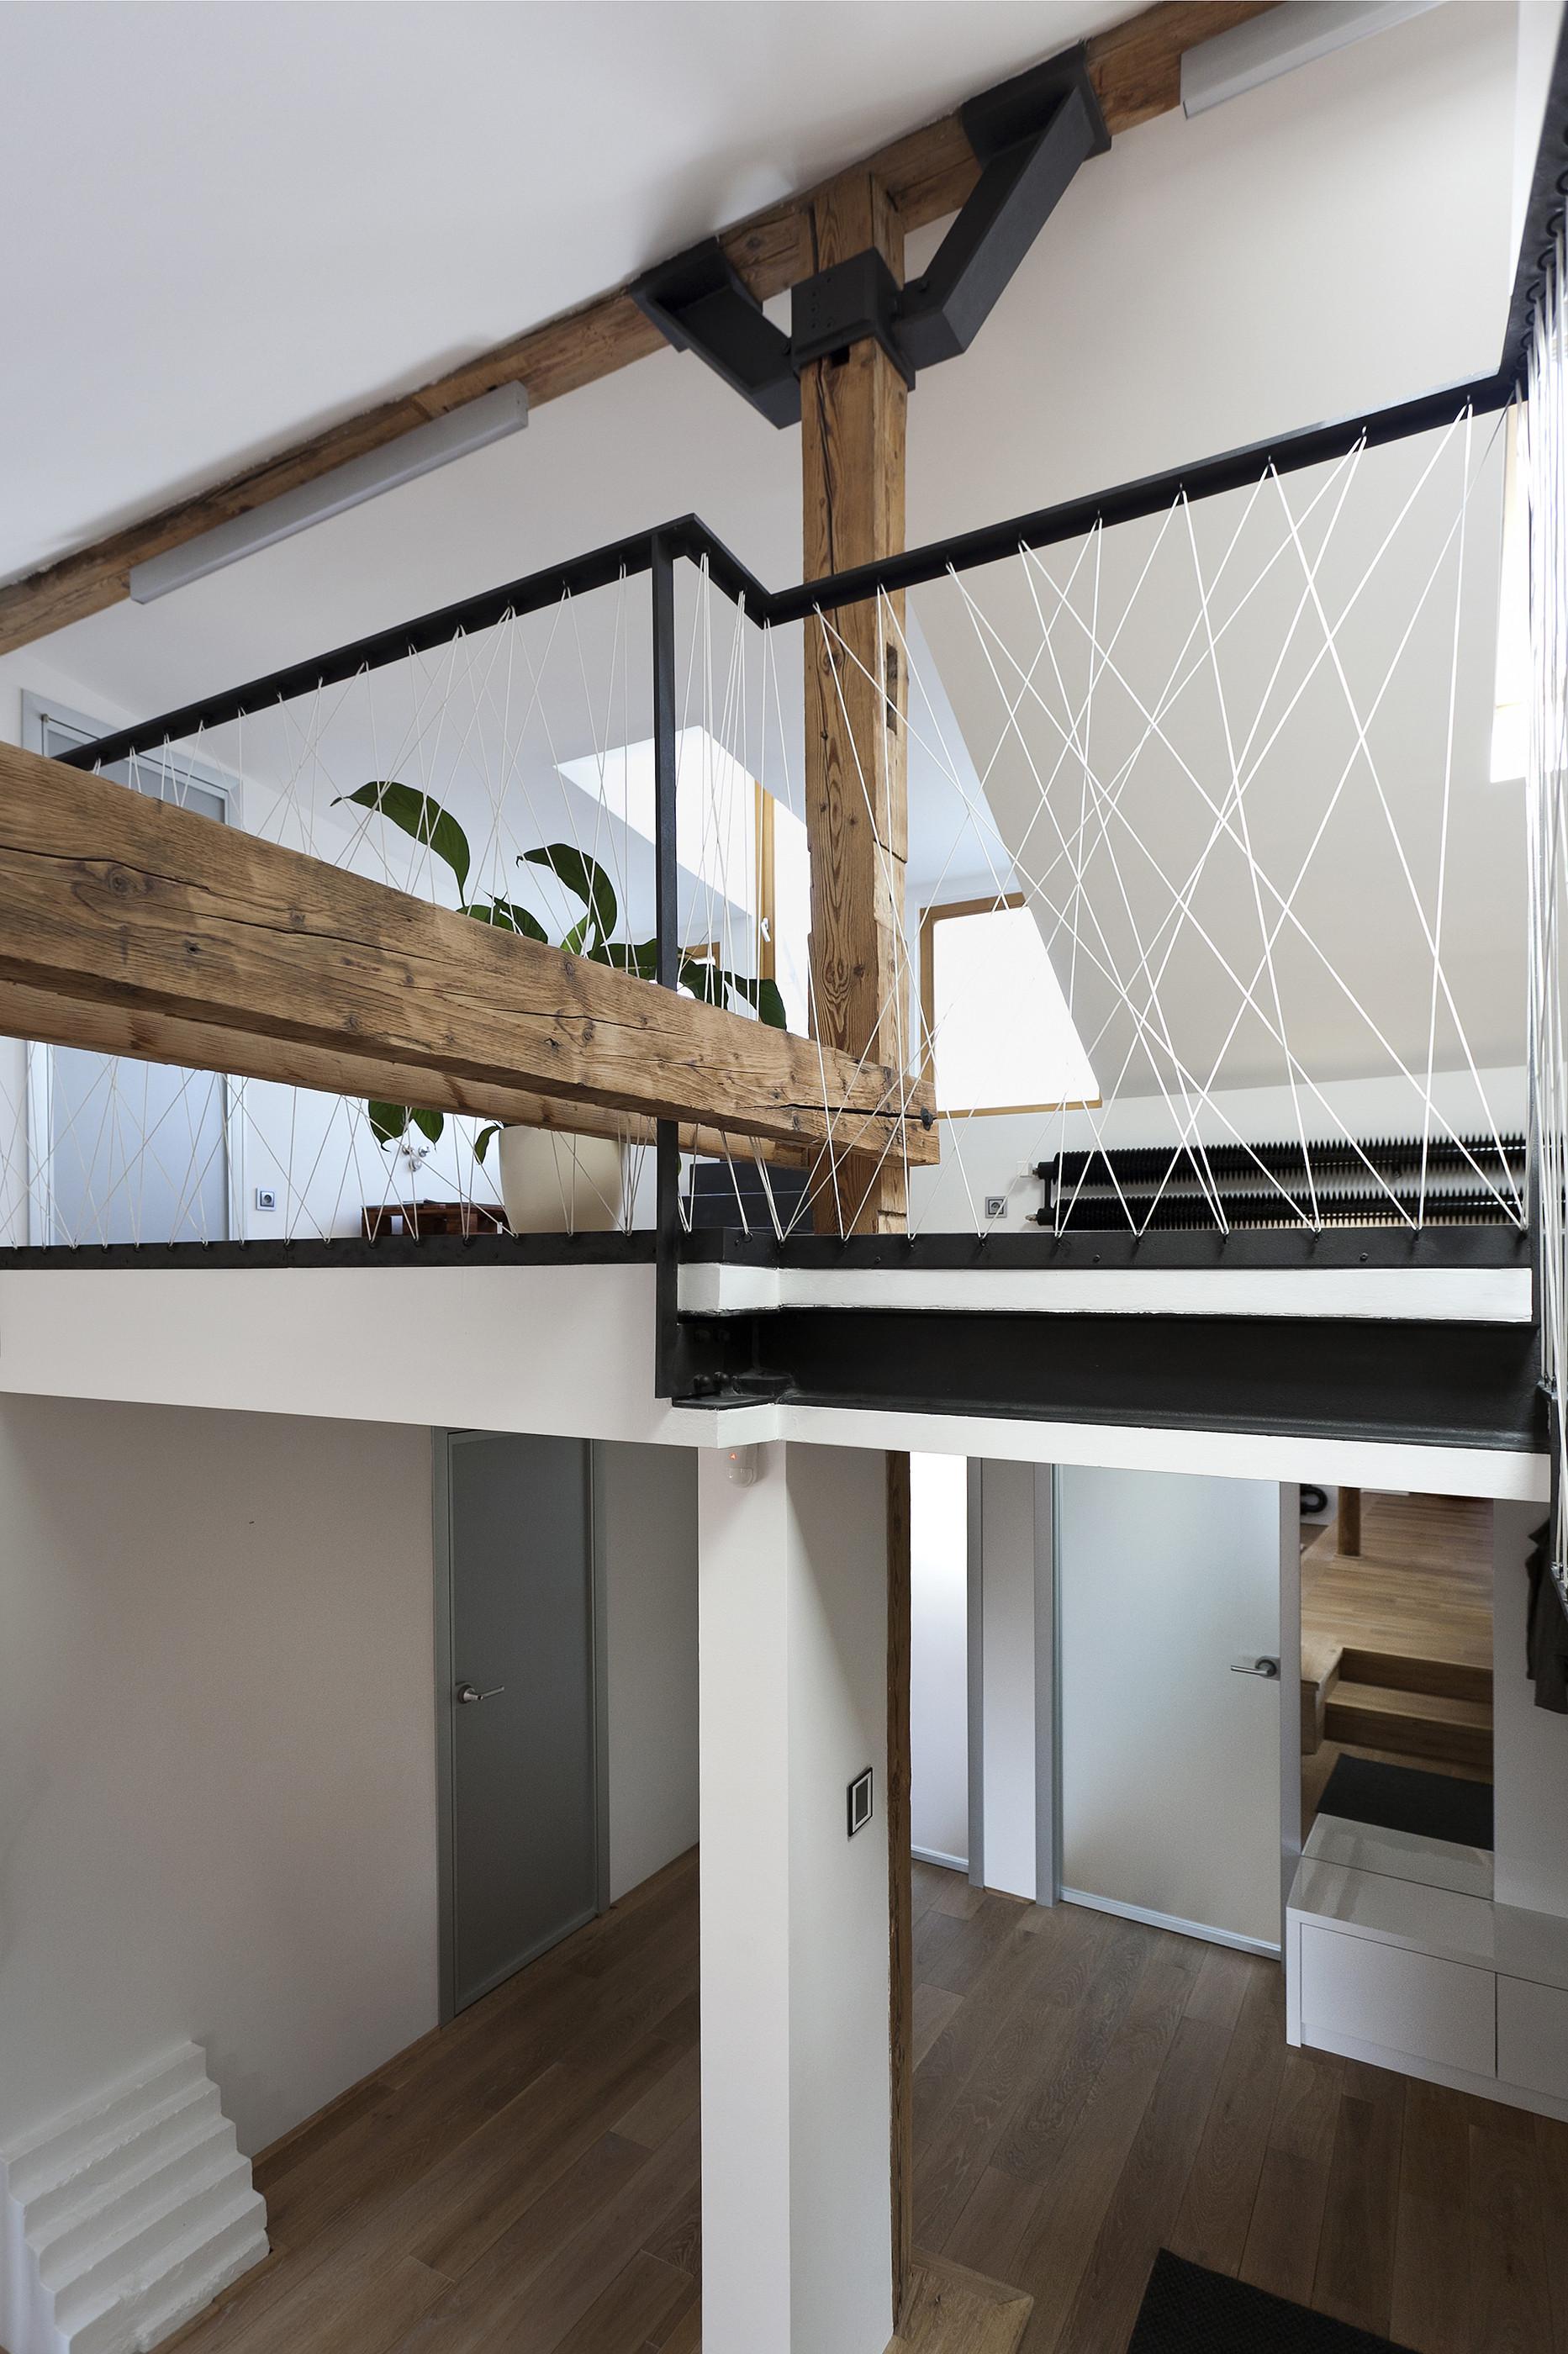 Gallery of attic loft reconstruction b architecture 4 for Architecture loft